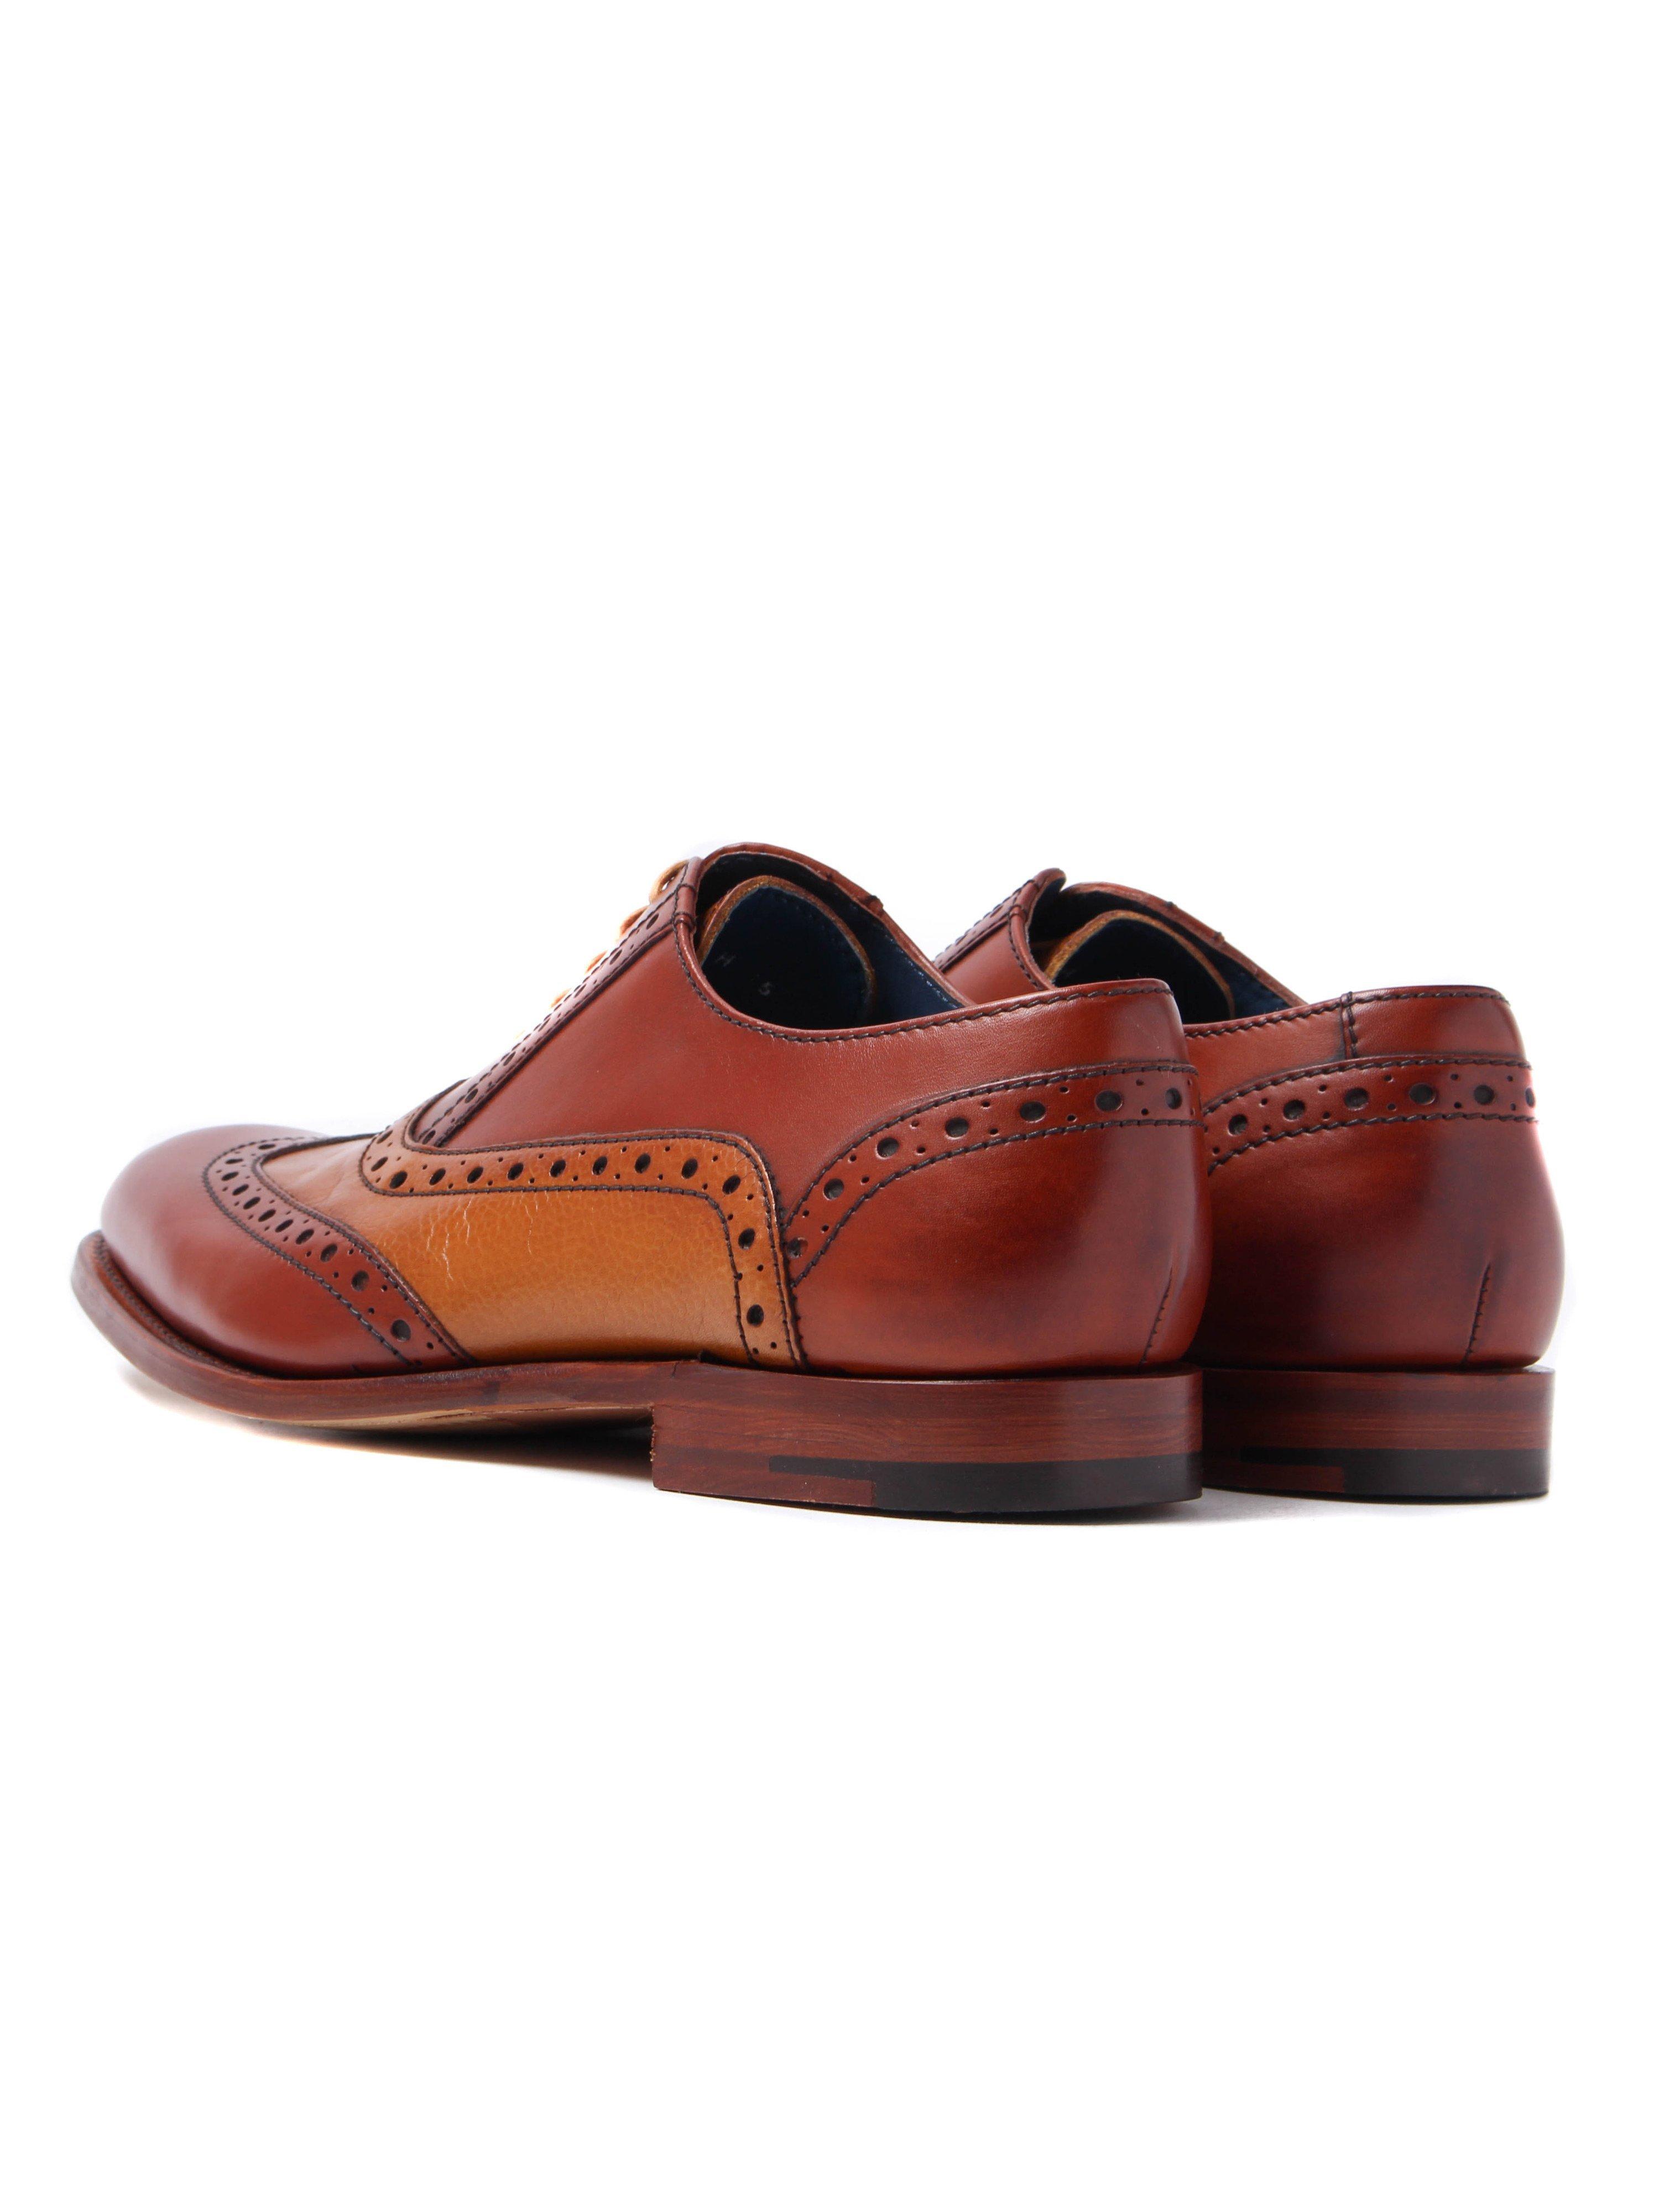 Barker Grant - Mens - Rosewood Calf/cedar